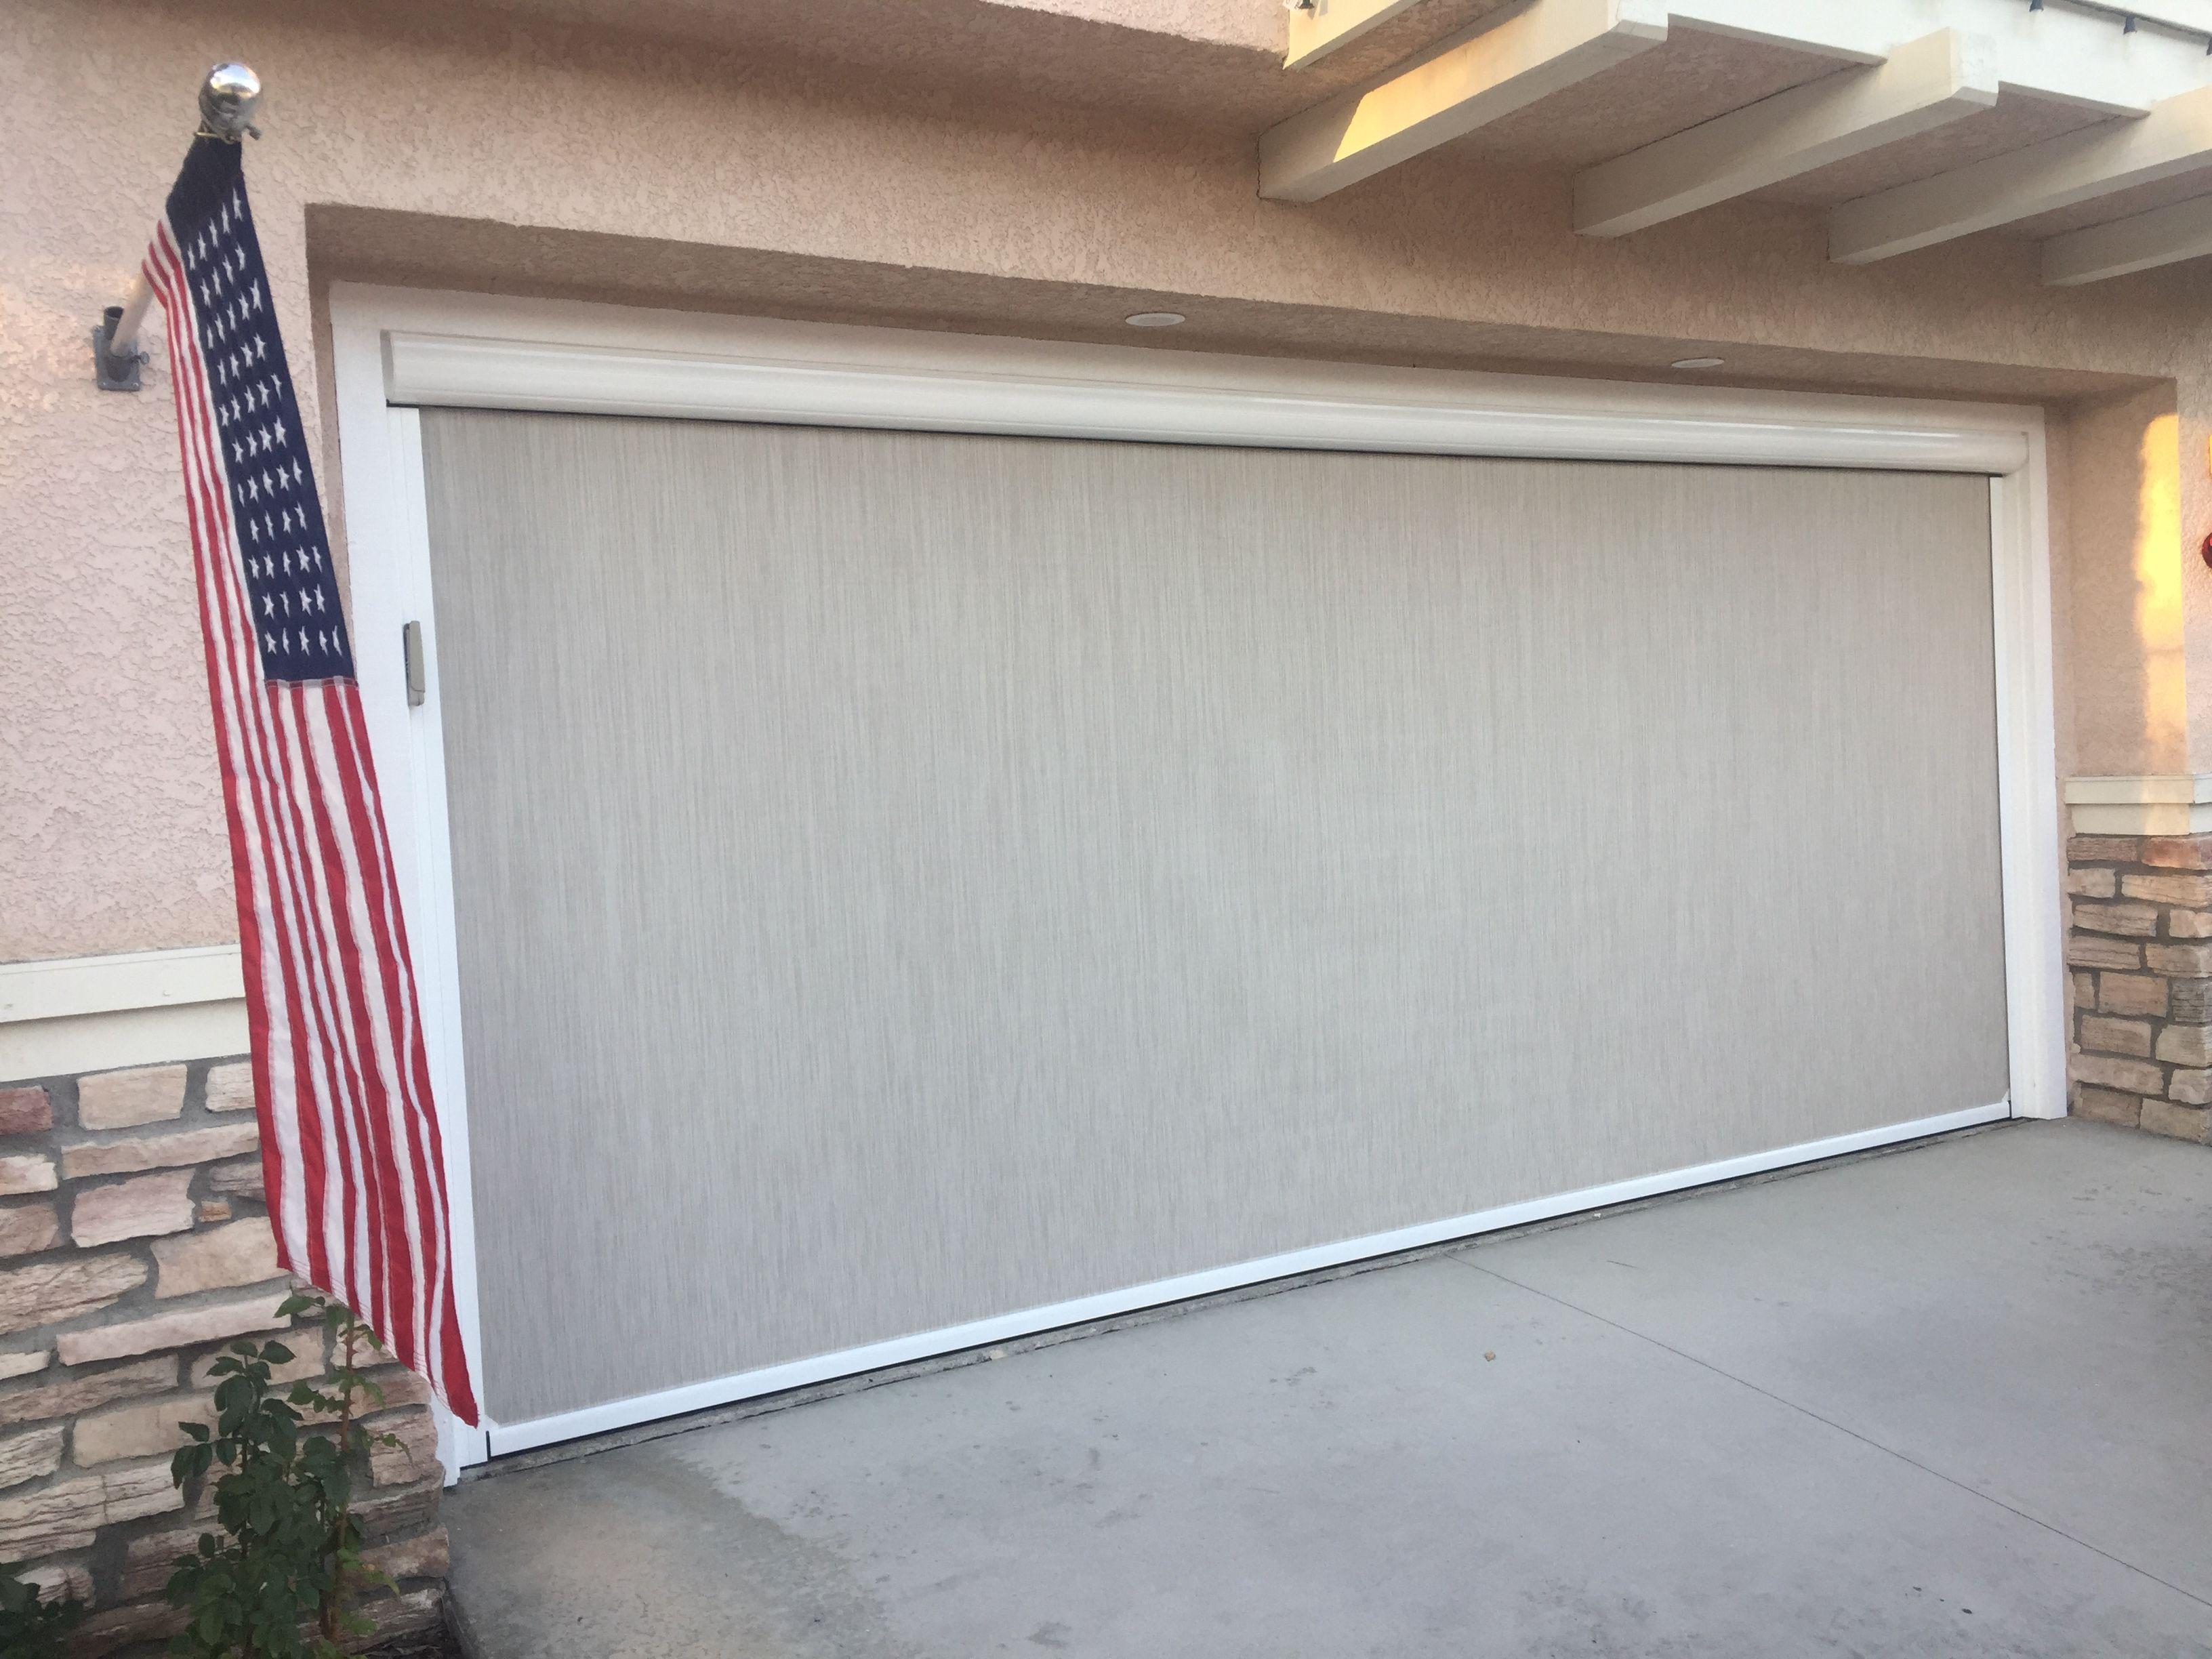 The First Approved Motorized Garage Door Power Screen In Aliso Viejo Hoa Do You Live In Aliso Viejo Califo Garage Screen Door Garage Doors Modern Garage Doors